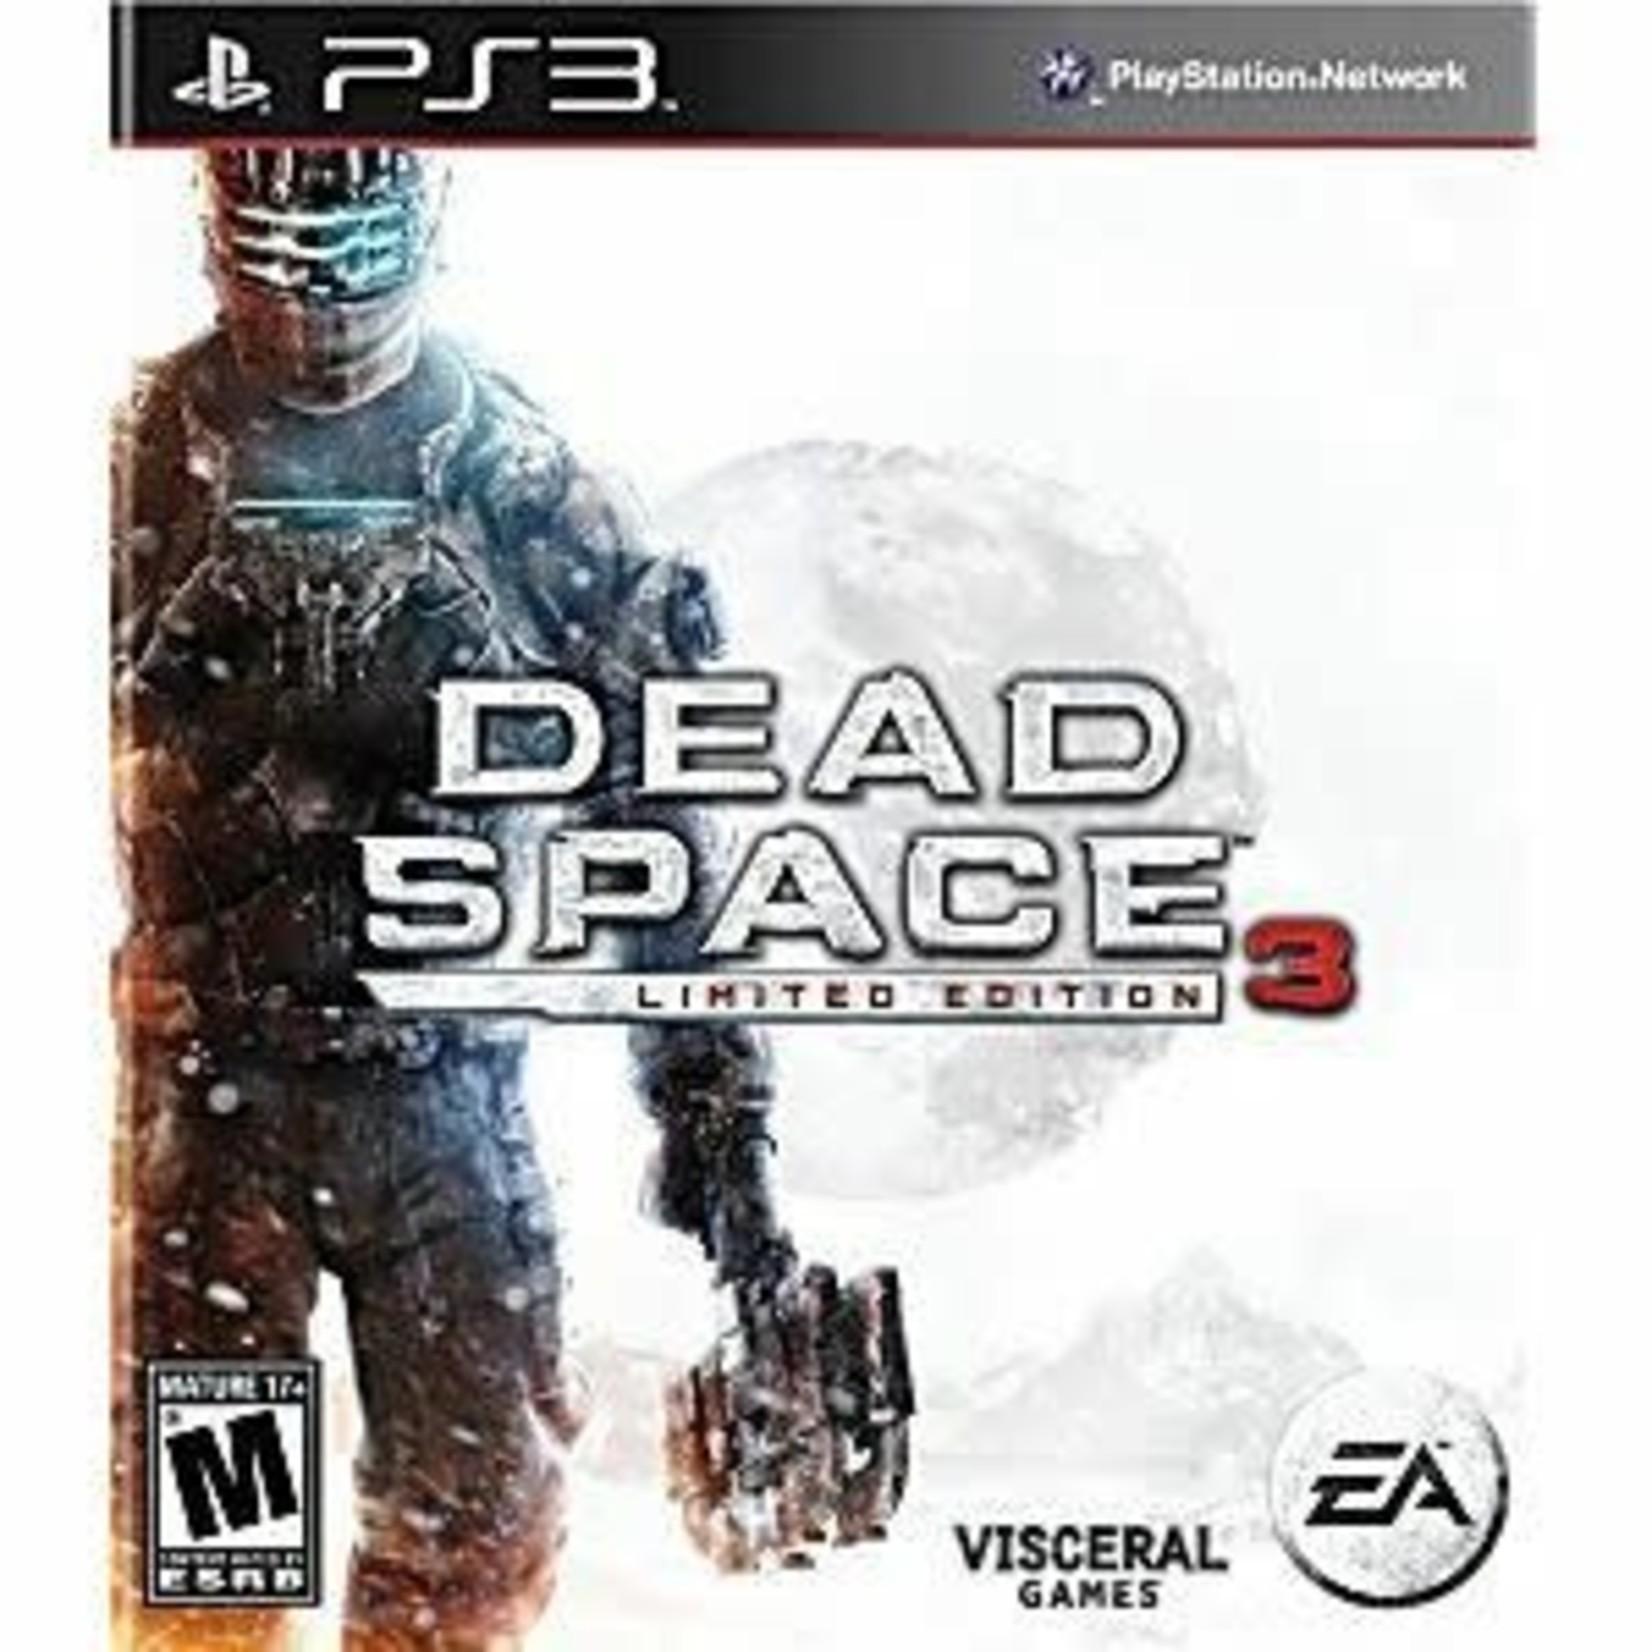 PS3U-DEAD SPACE 3